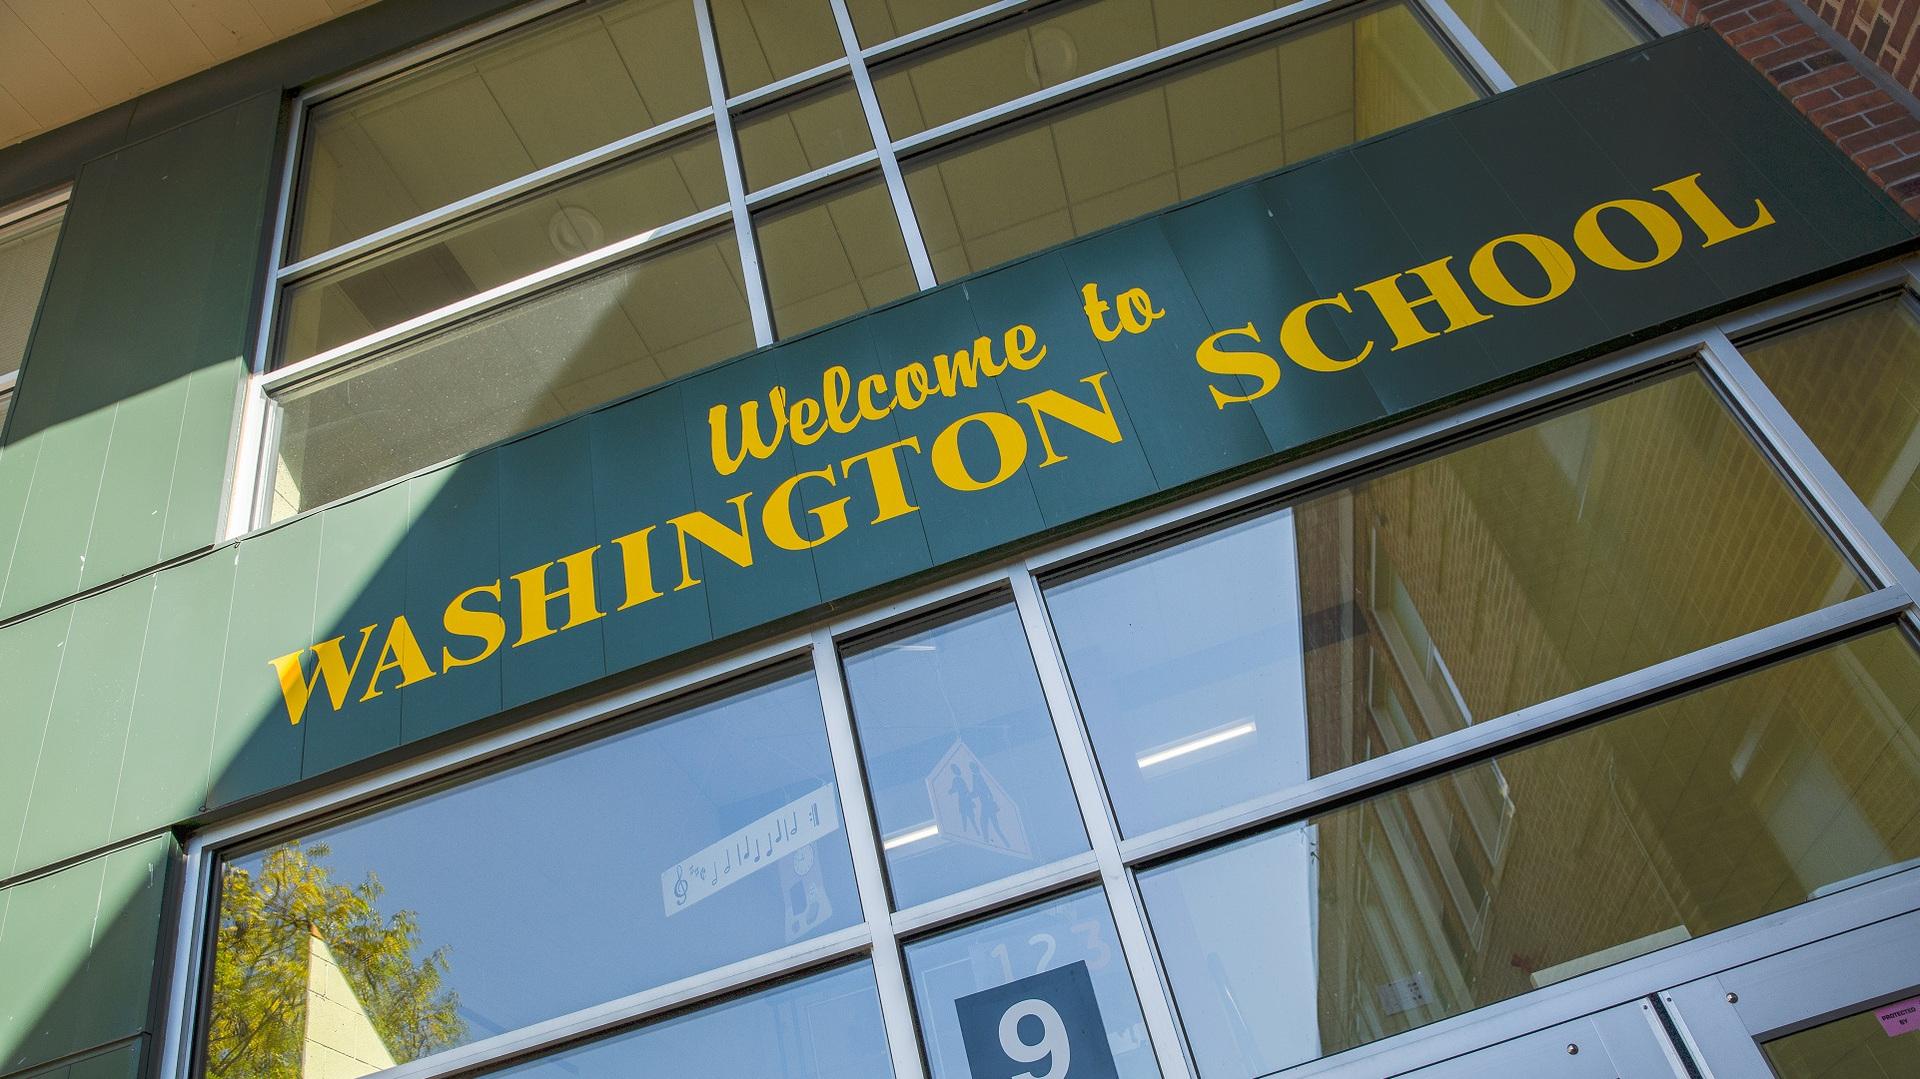 Home - Washington Elementary